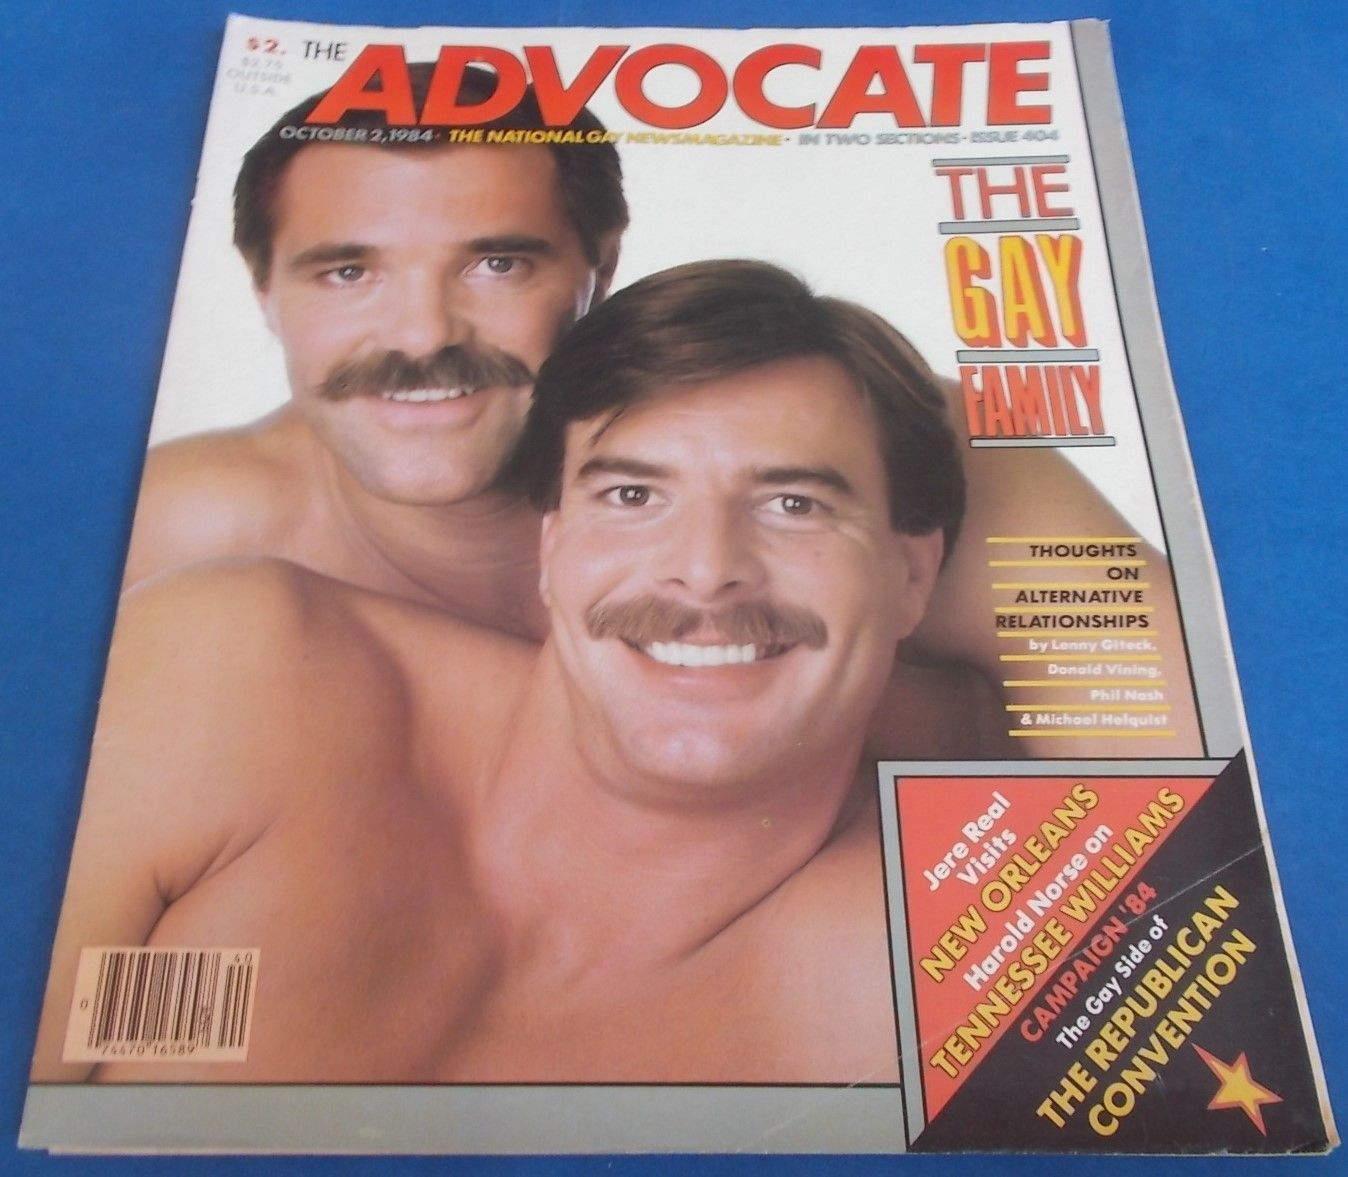 gay bar underwear night